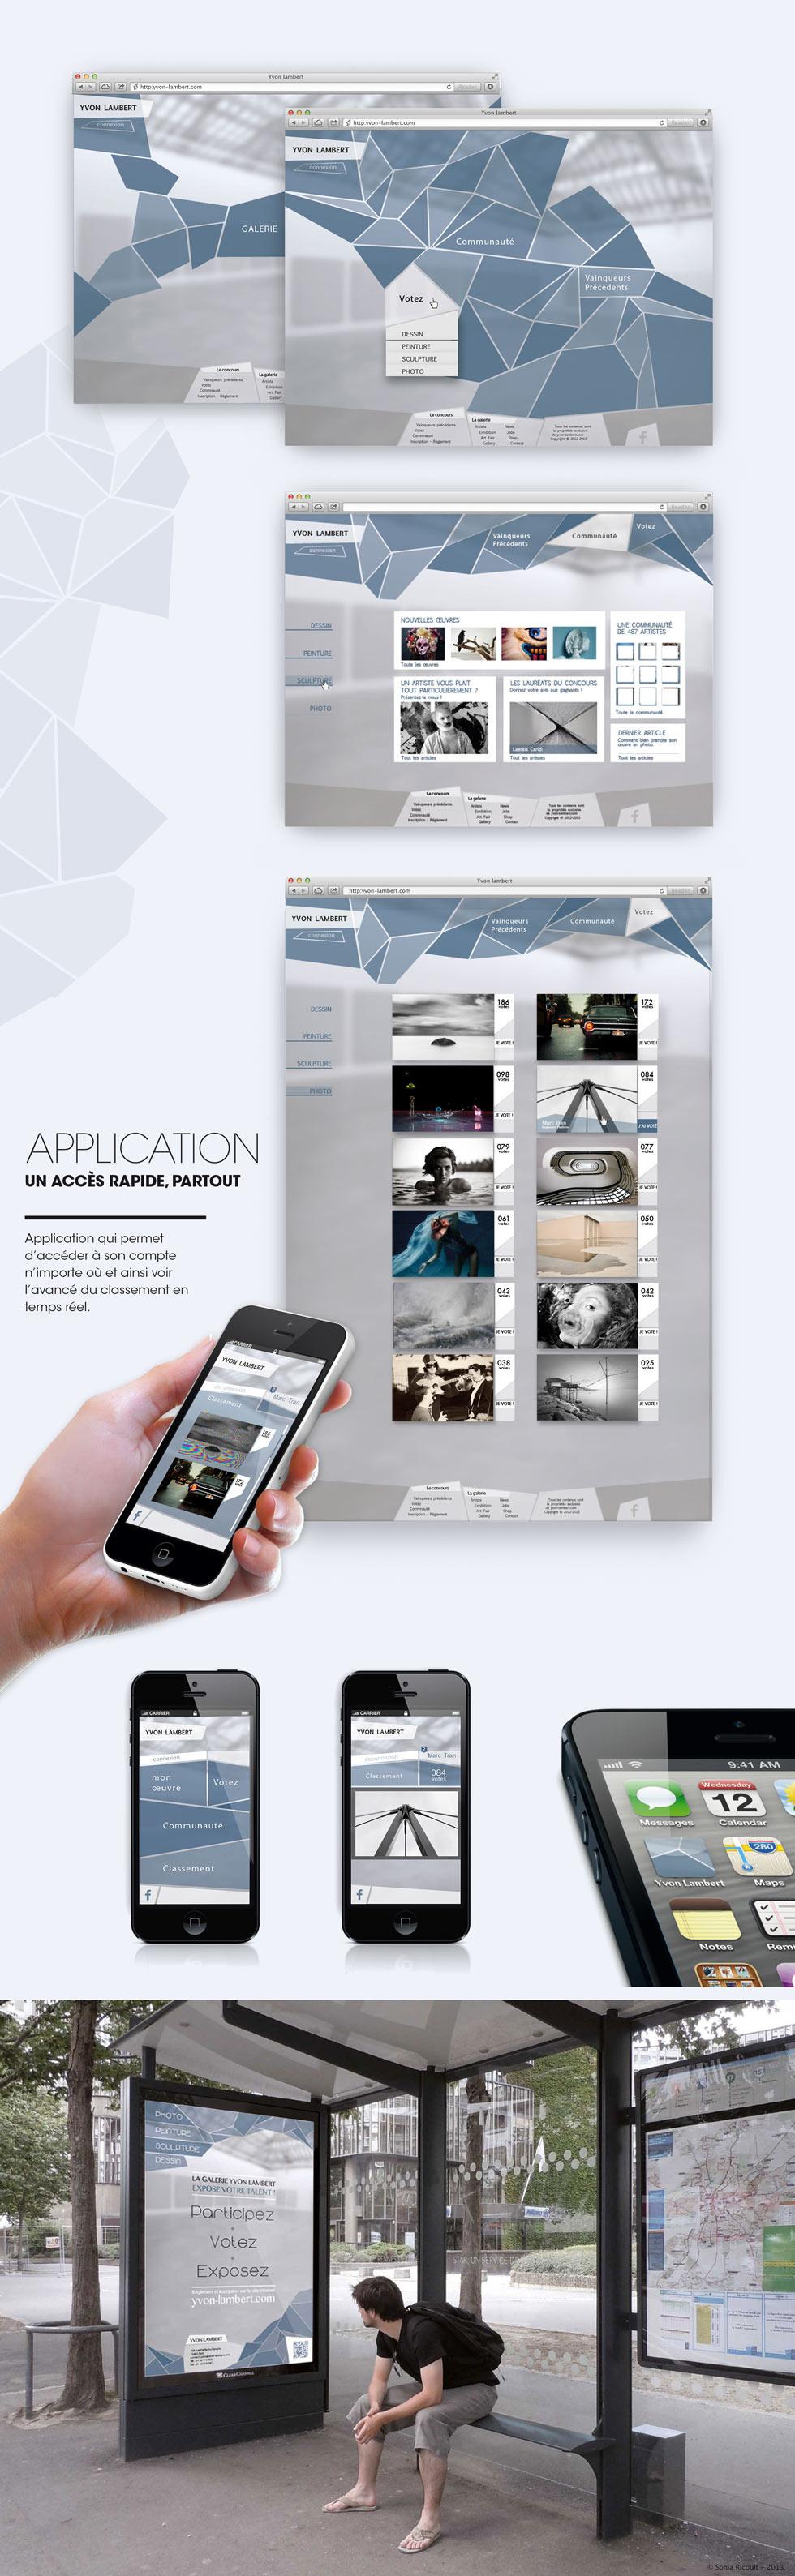 ©Sonia Ricoult Webdesign, identité, concours, Yvon Lambert, graphisme